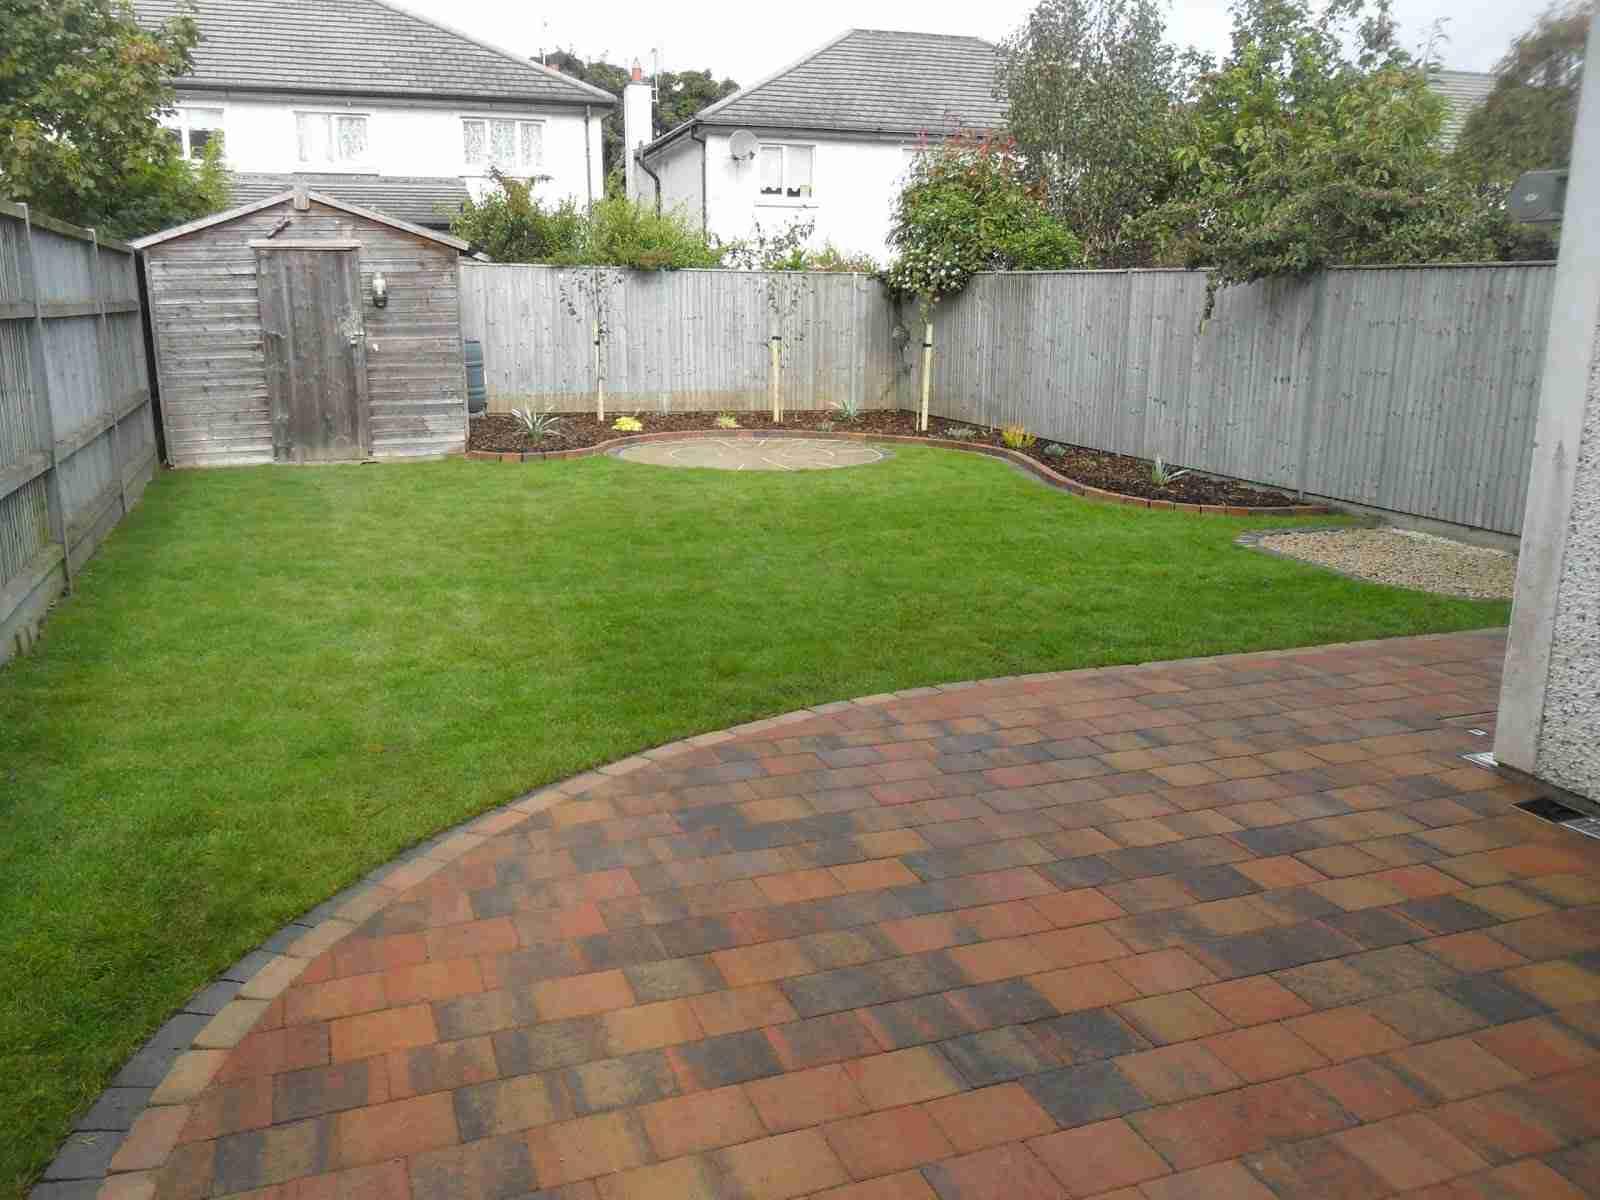 Circular Patio,Raised Patio Garden Design, Roschoill ... on Raised Patio Designs  id=17296